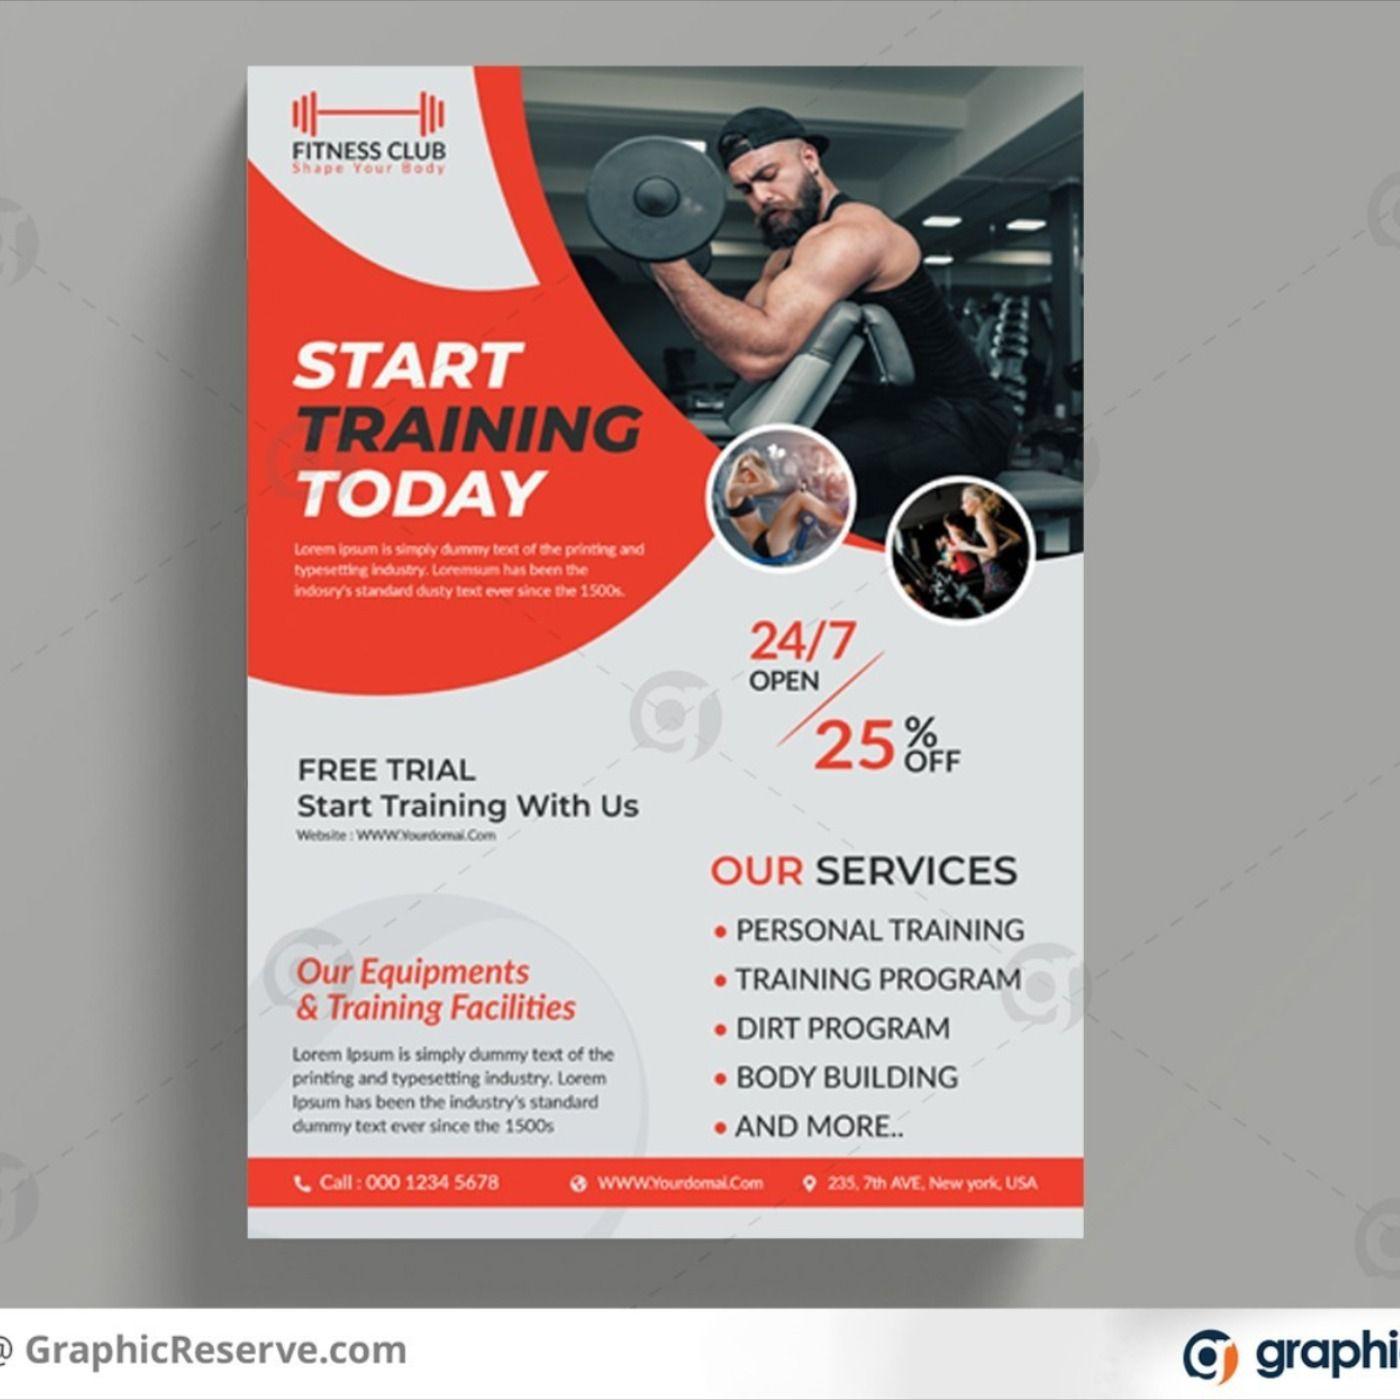 Fitness gym flyer design template in 2020 Flyer design